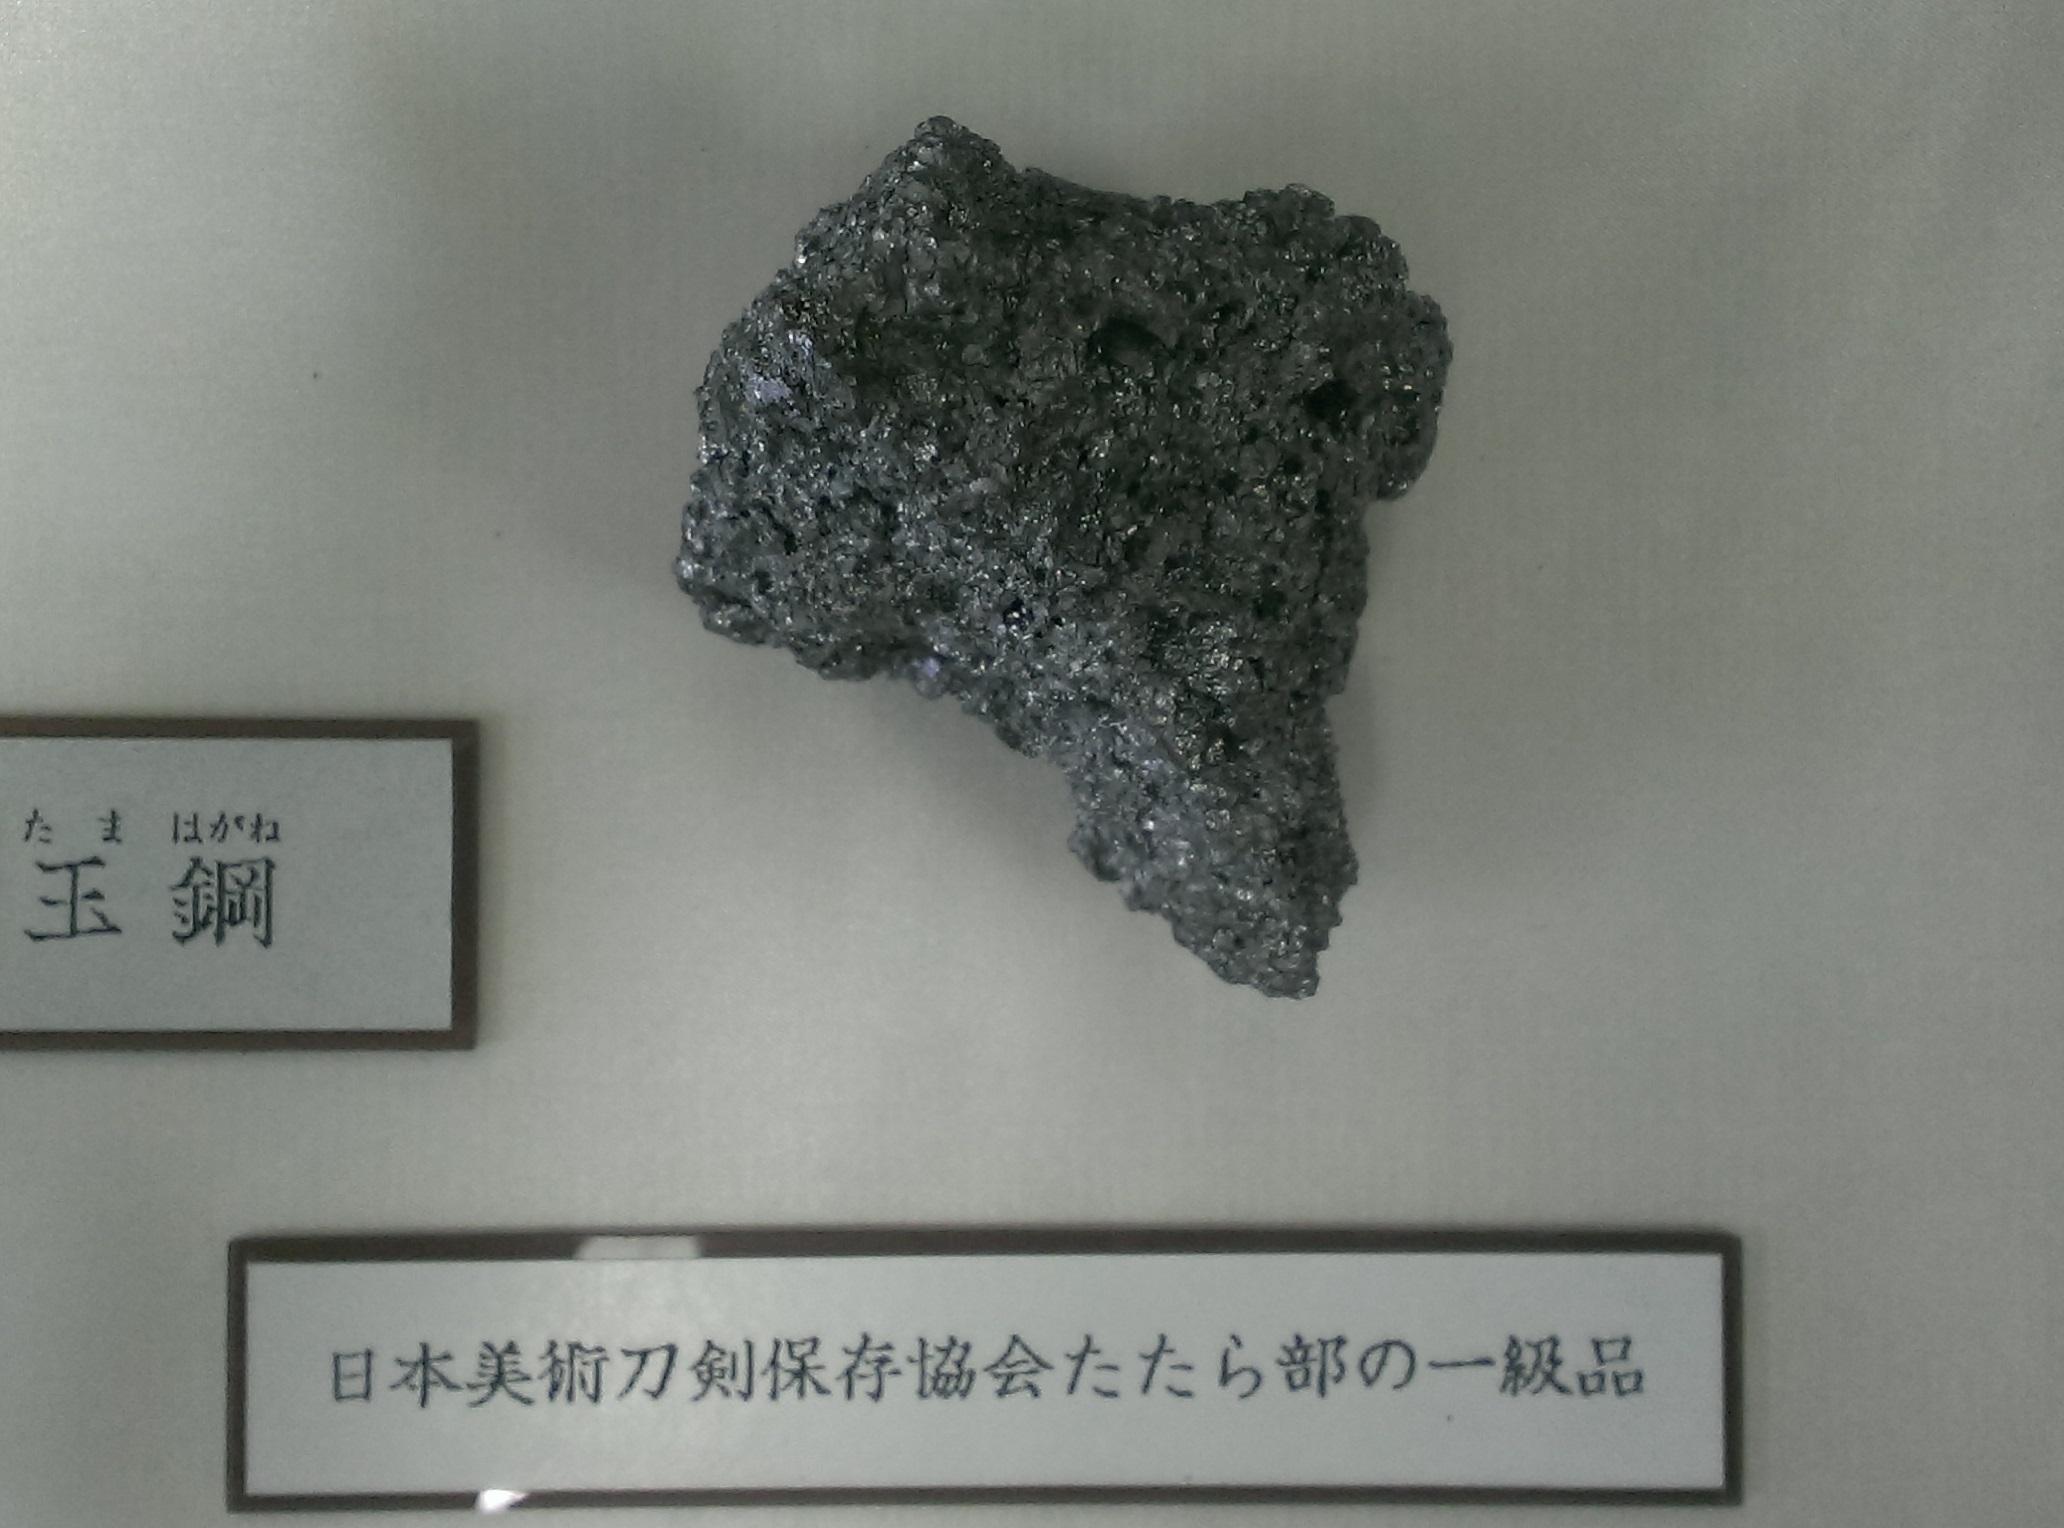 https://upload.wikimedia.org/wikipedia/commons/8/8d/Tamahagane_yao.jpg